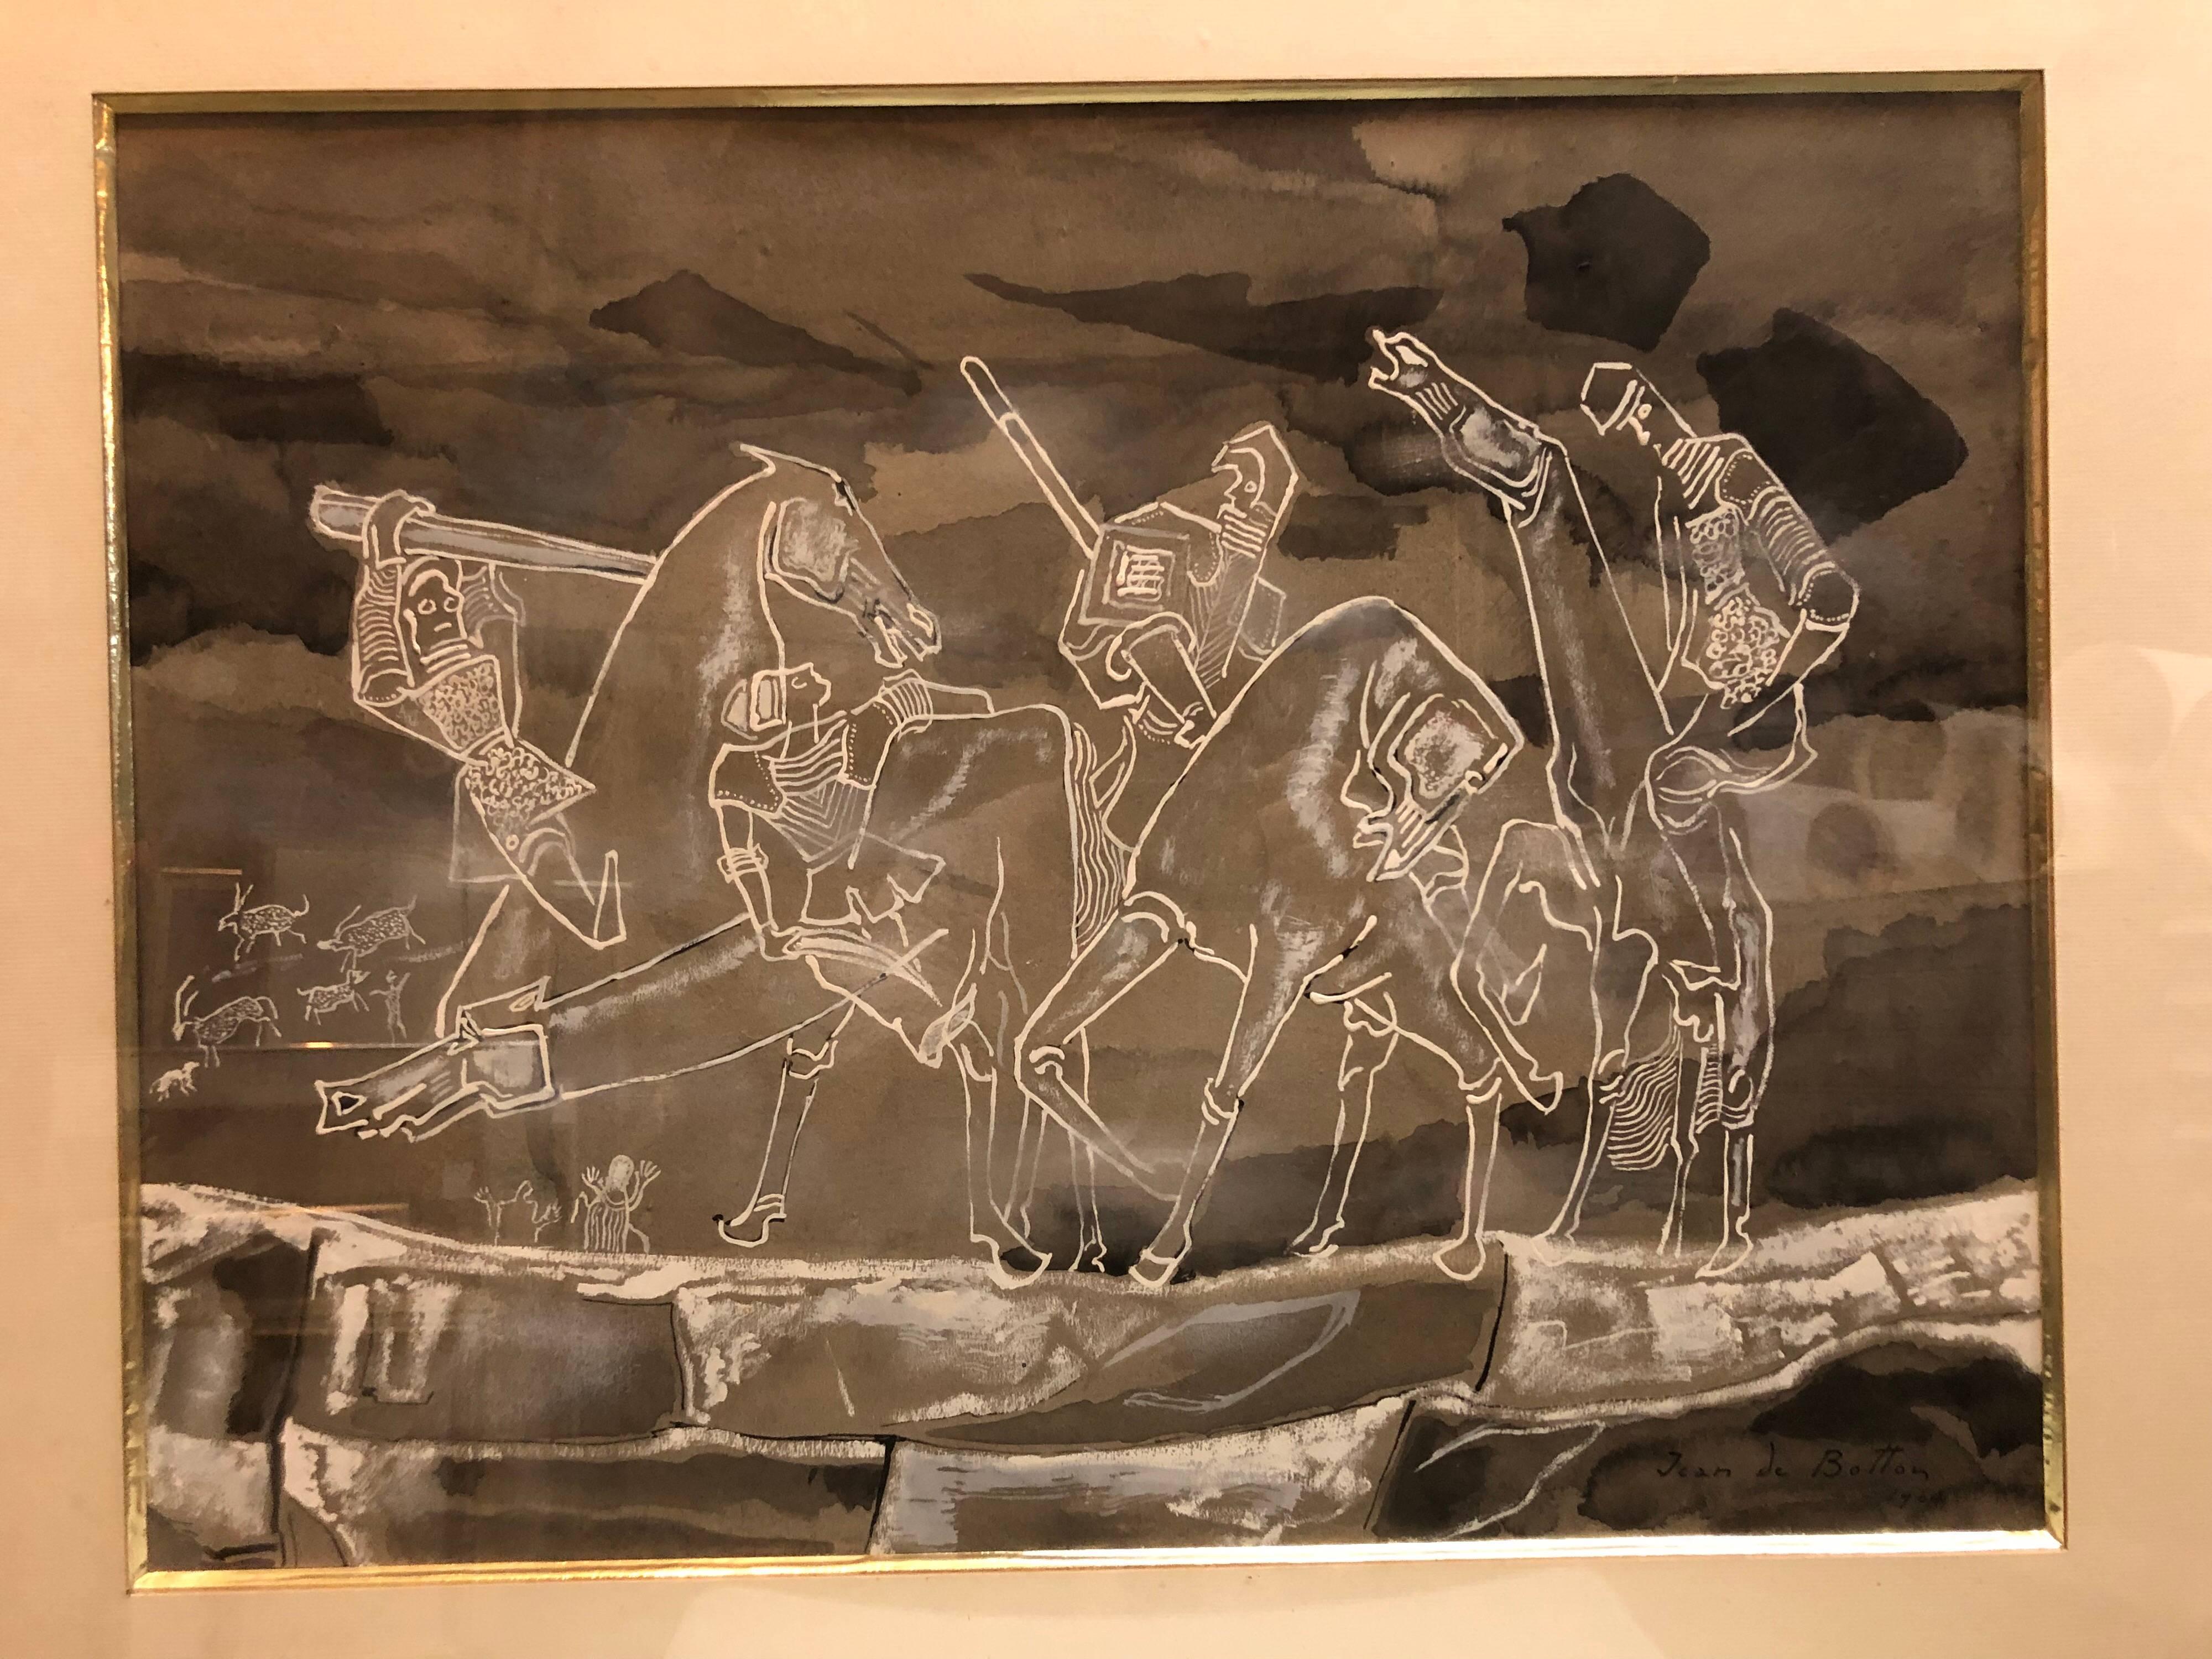 Large French Art Deco Four Horsemen of Apocalypse Watercolor Gouache Painting